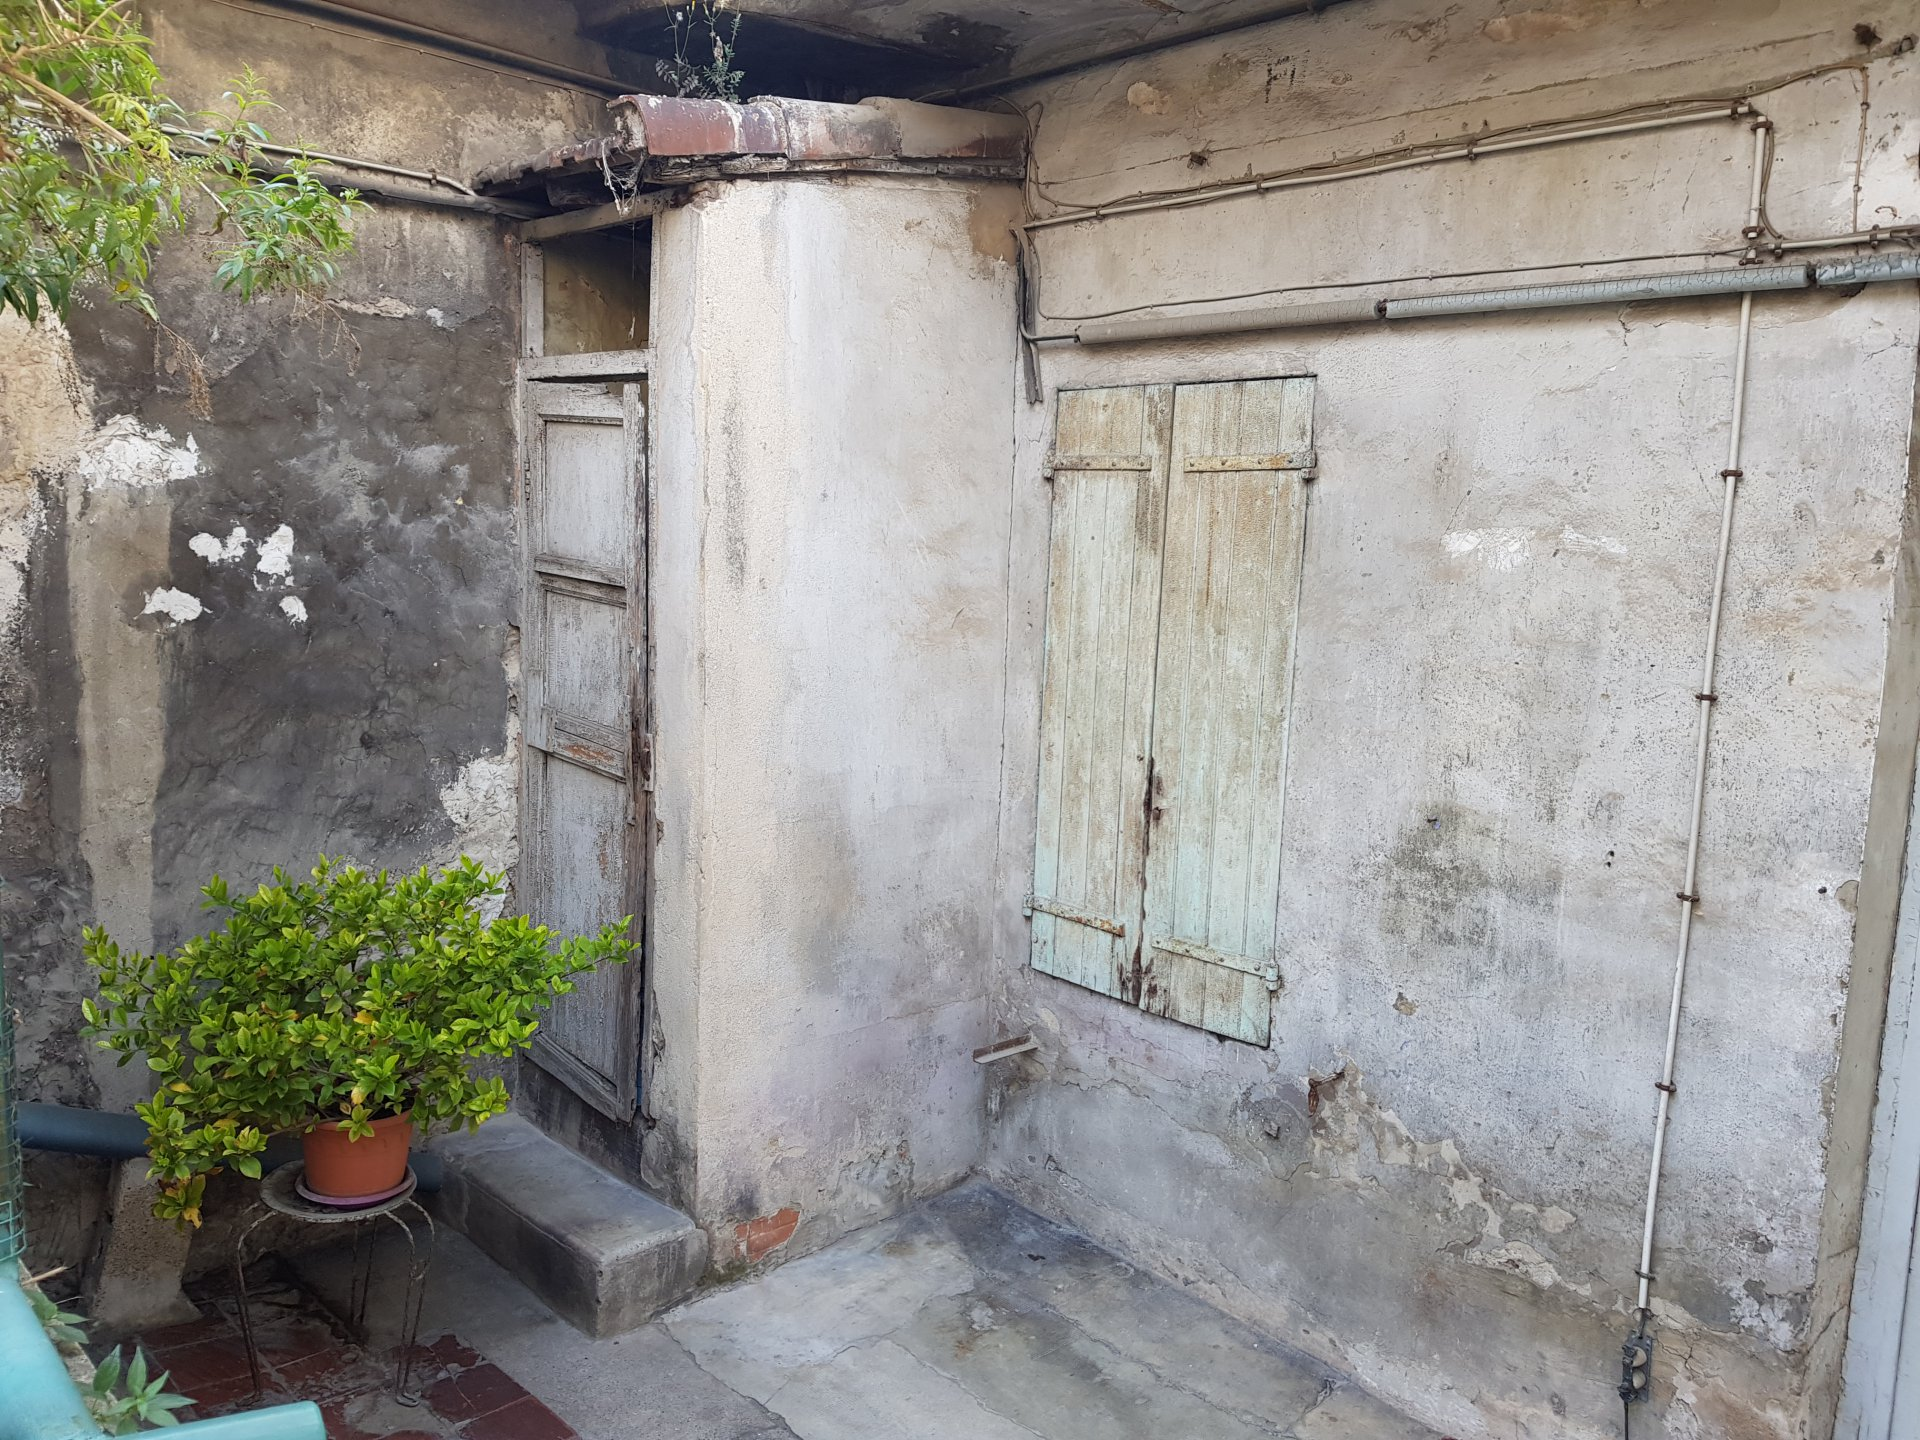 Type 2 de 25 m2 + Petite terrasse